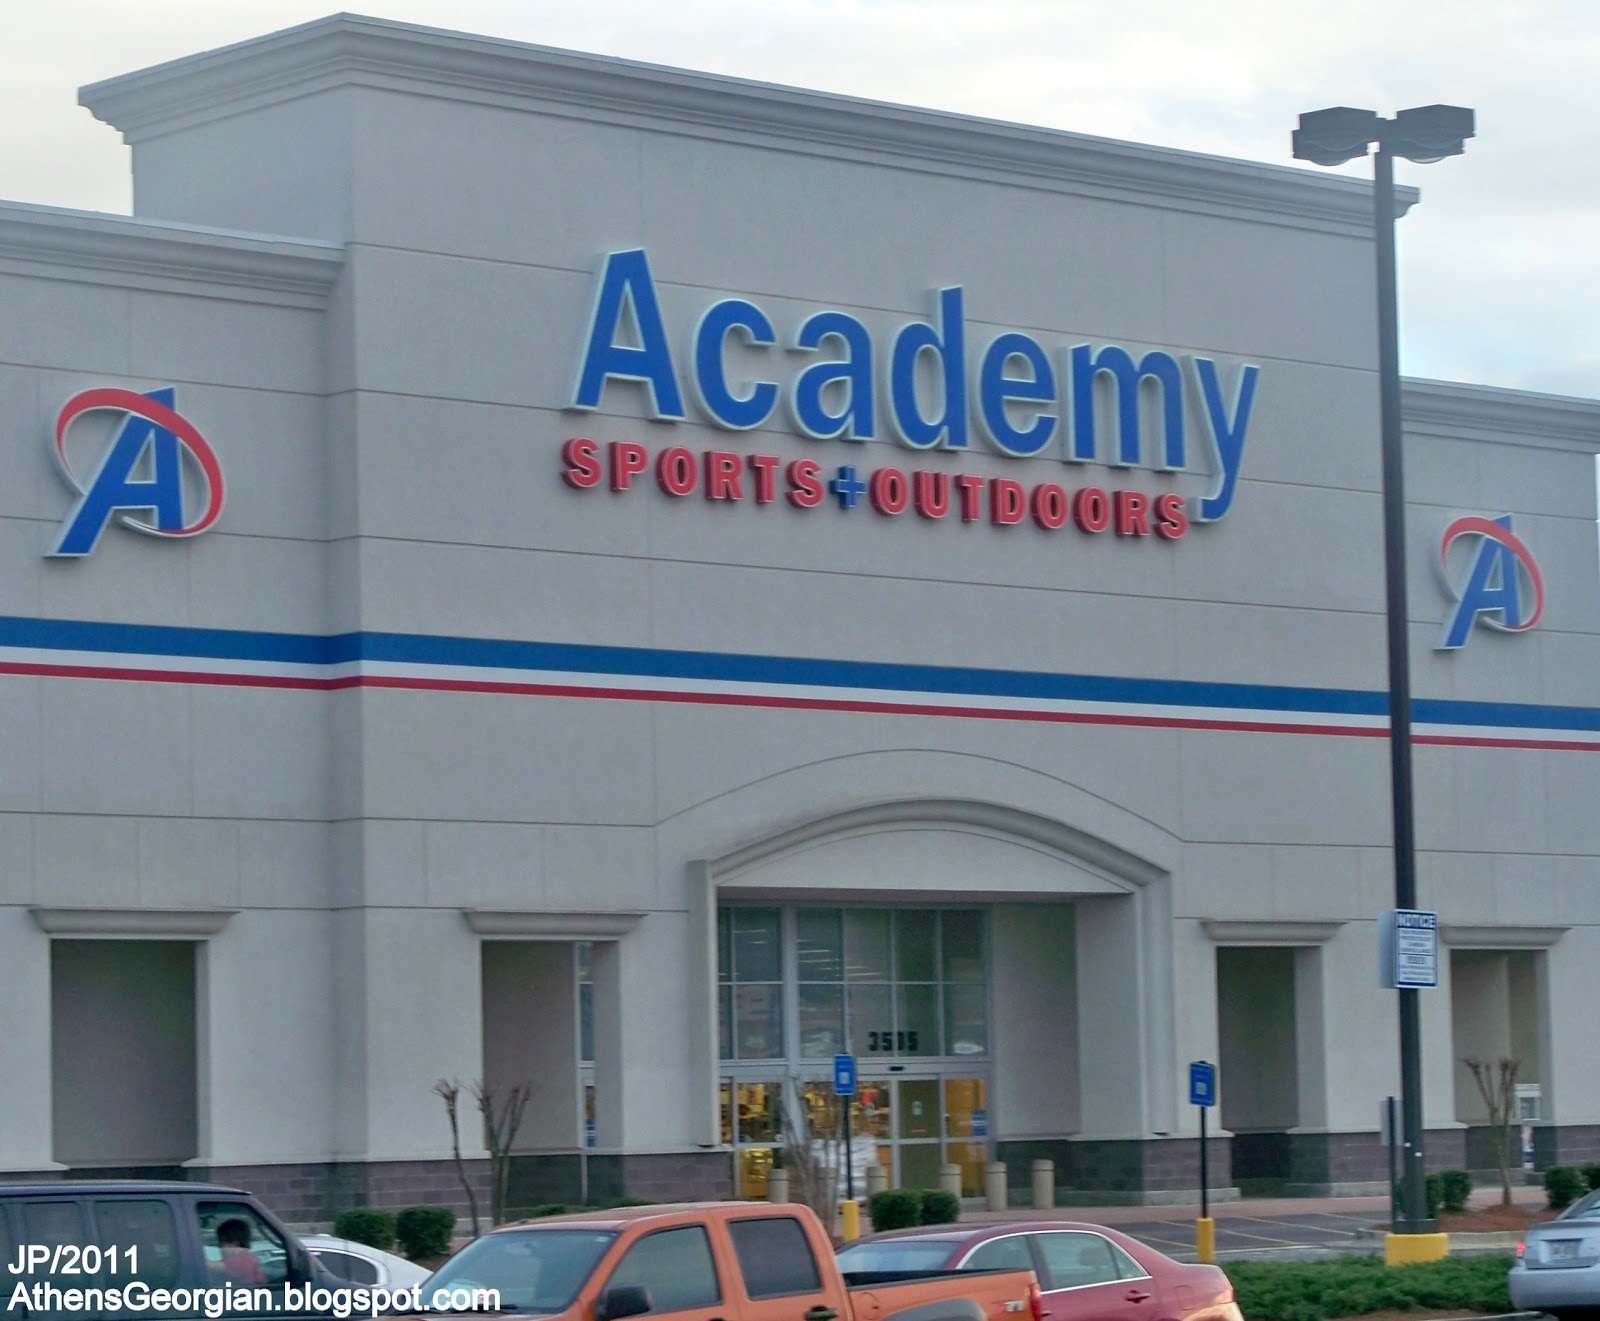 academy sports athens georgia outdoors ga atlanta fire highway retail hospital uga